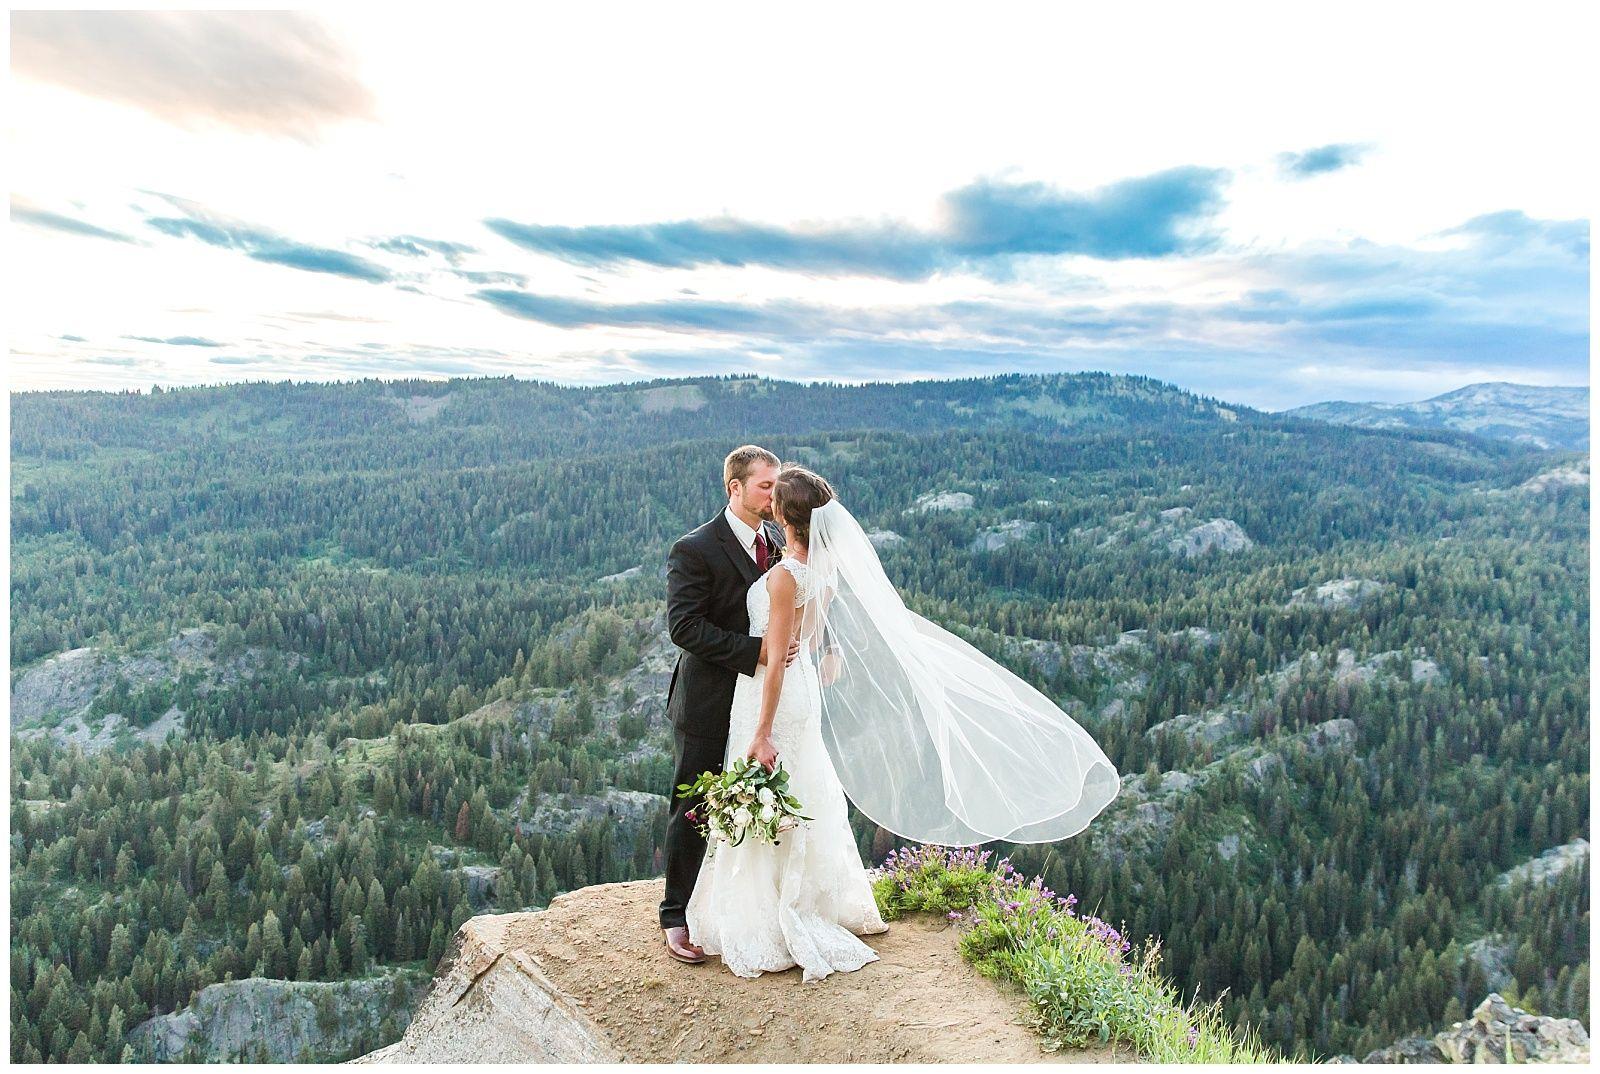 Brundage Mountain Resort, Brundage Mountain Resort Wedding